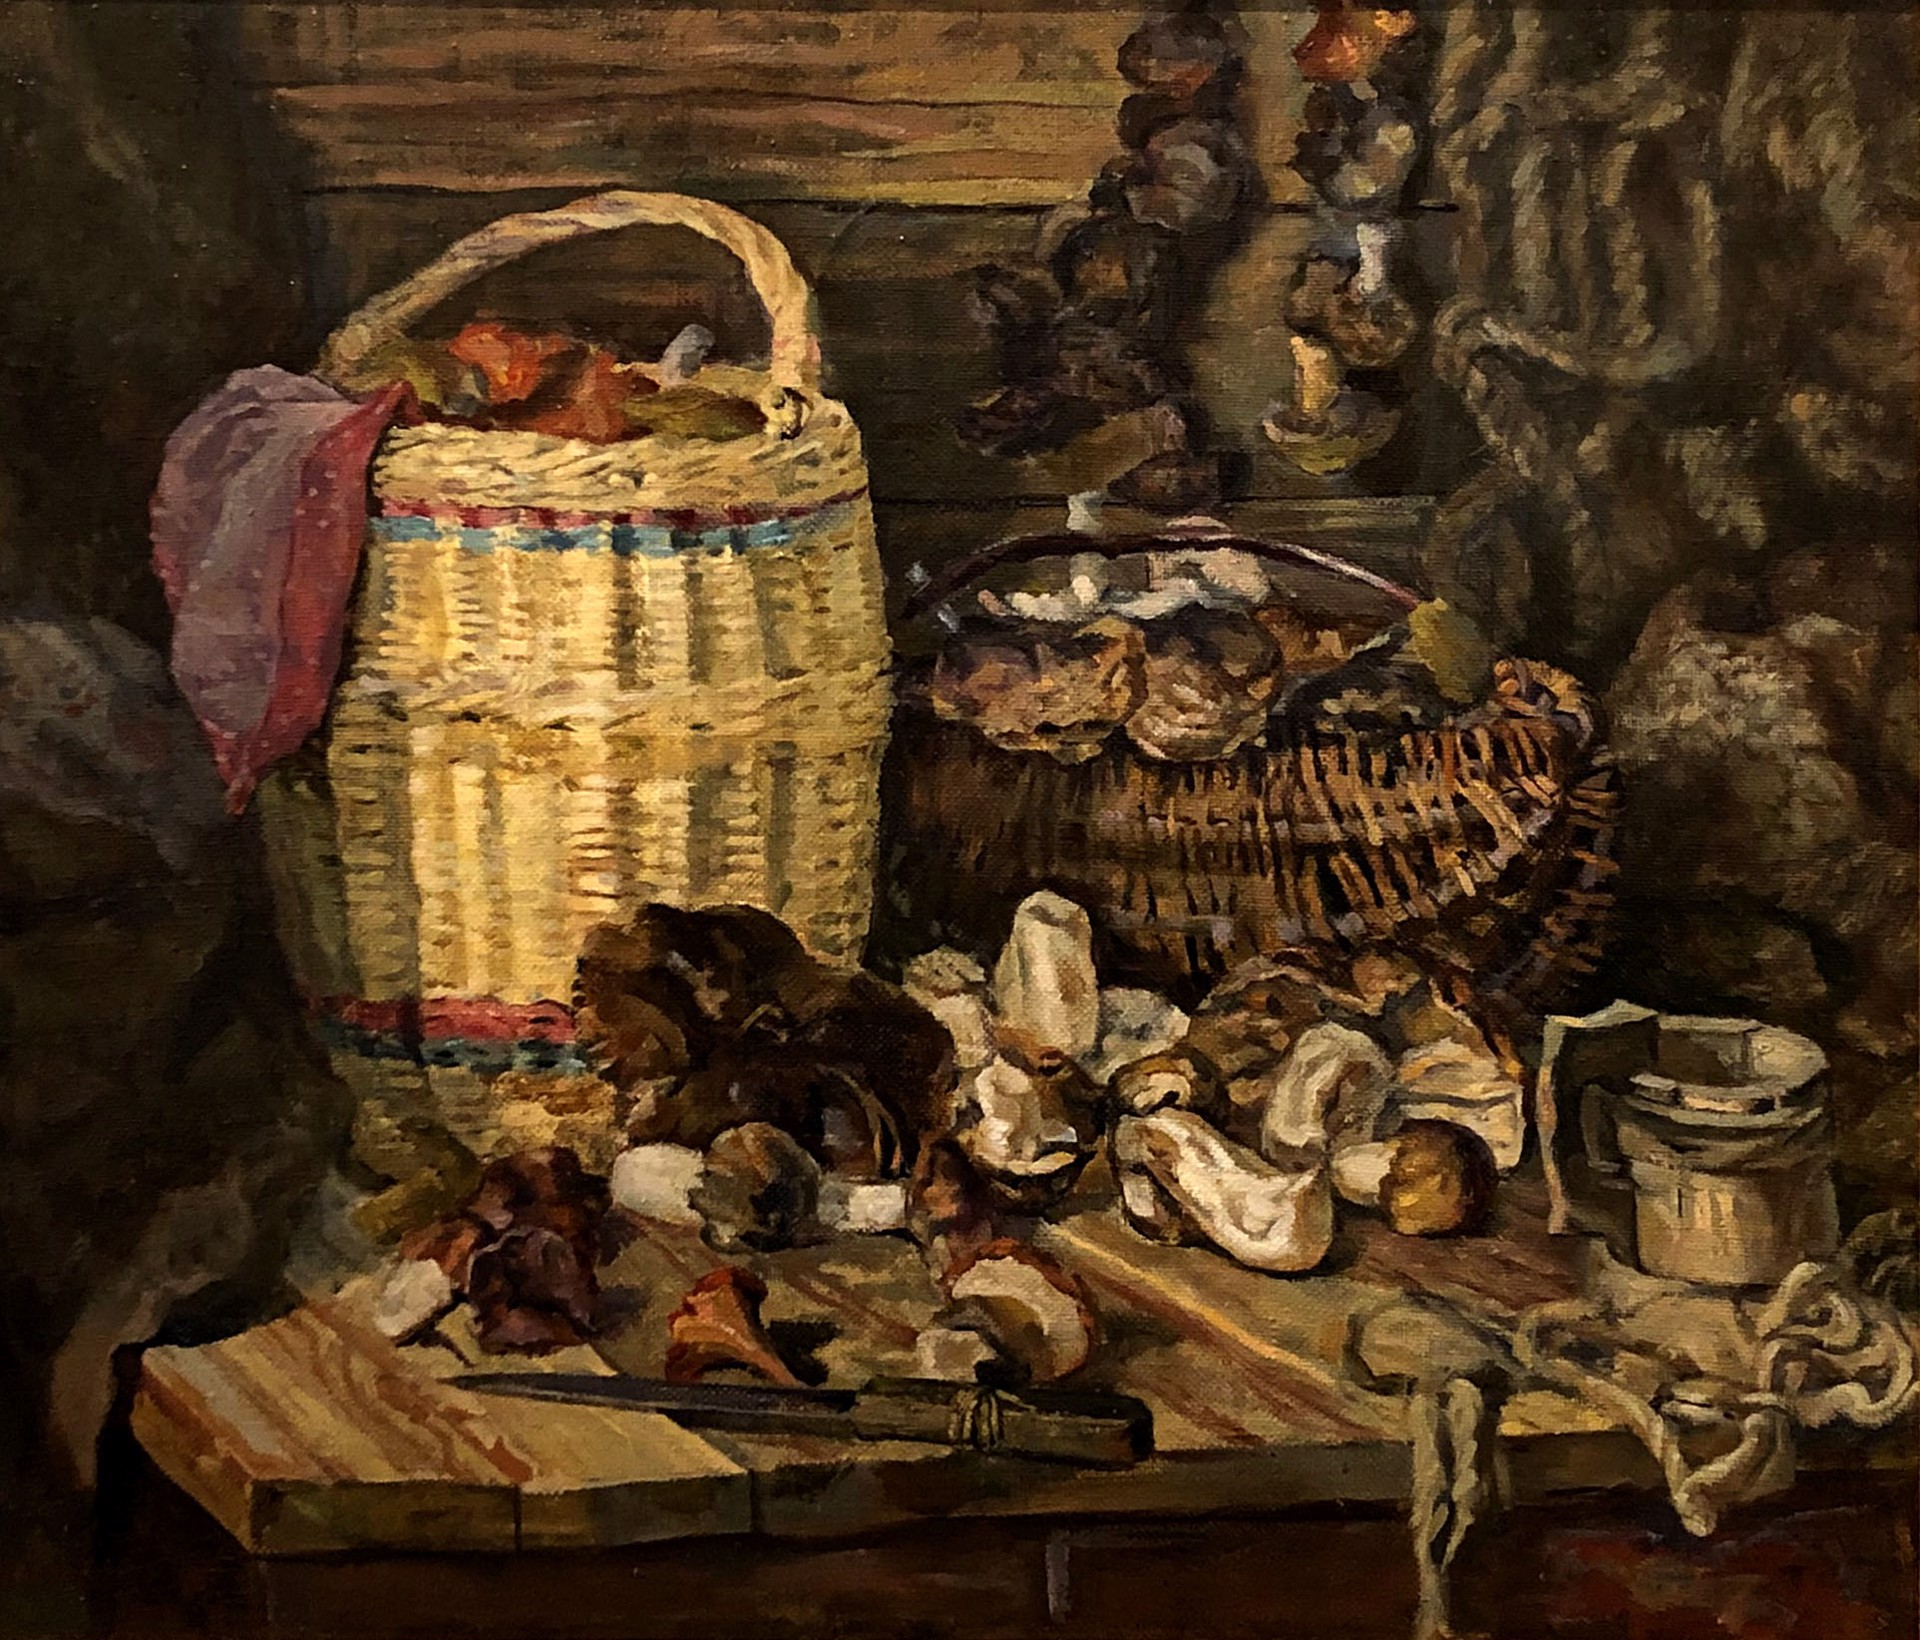 Vladimir Dmitrievivh Fefelov - Still Life With Basket by Russian Artists